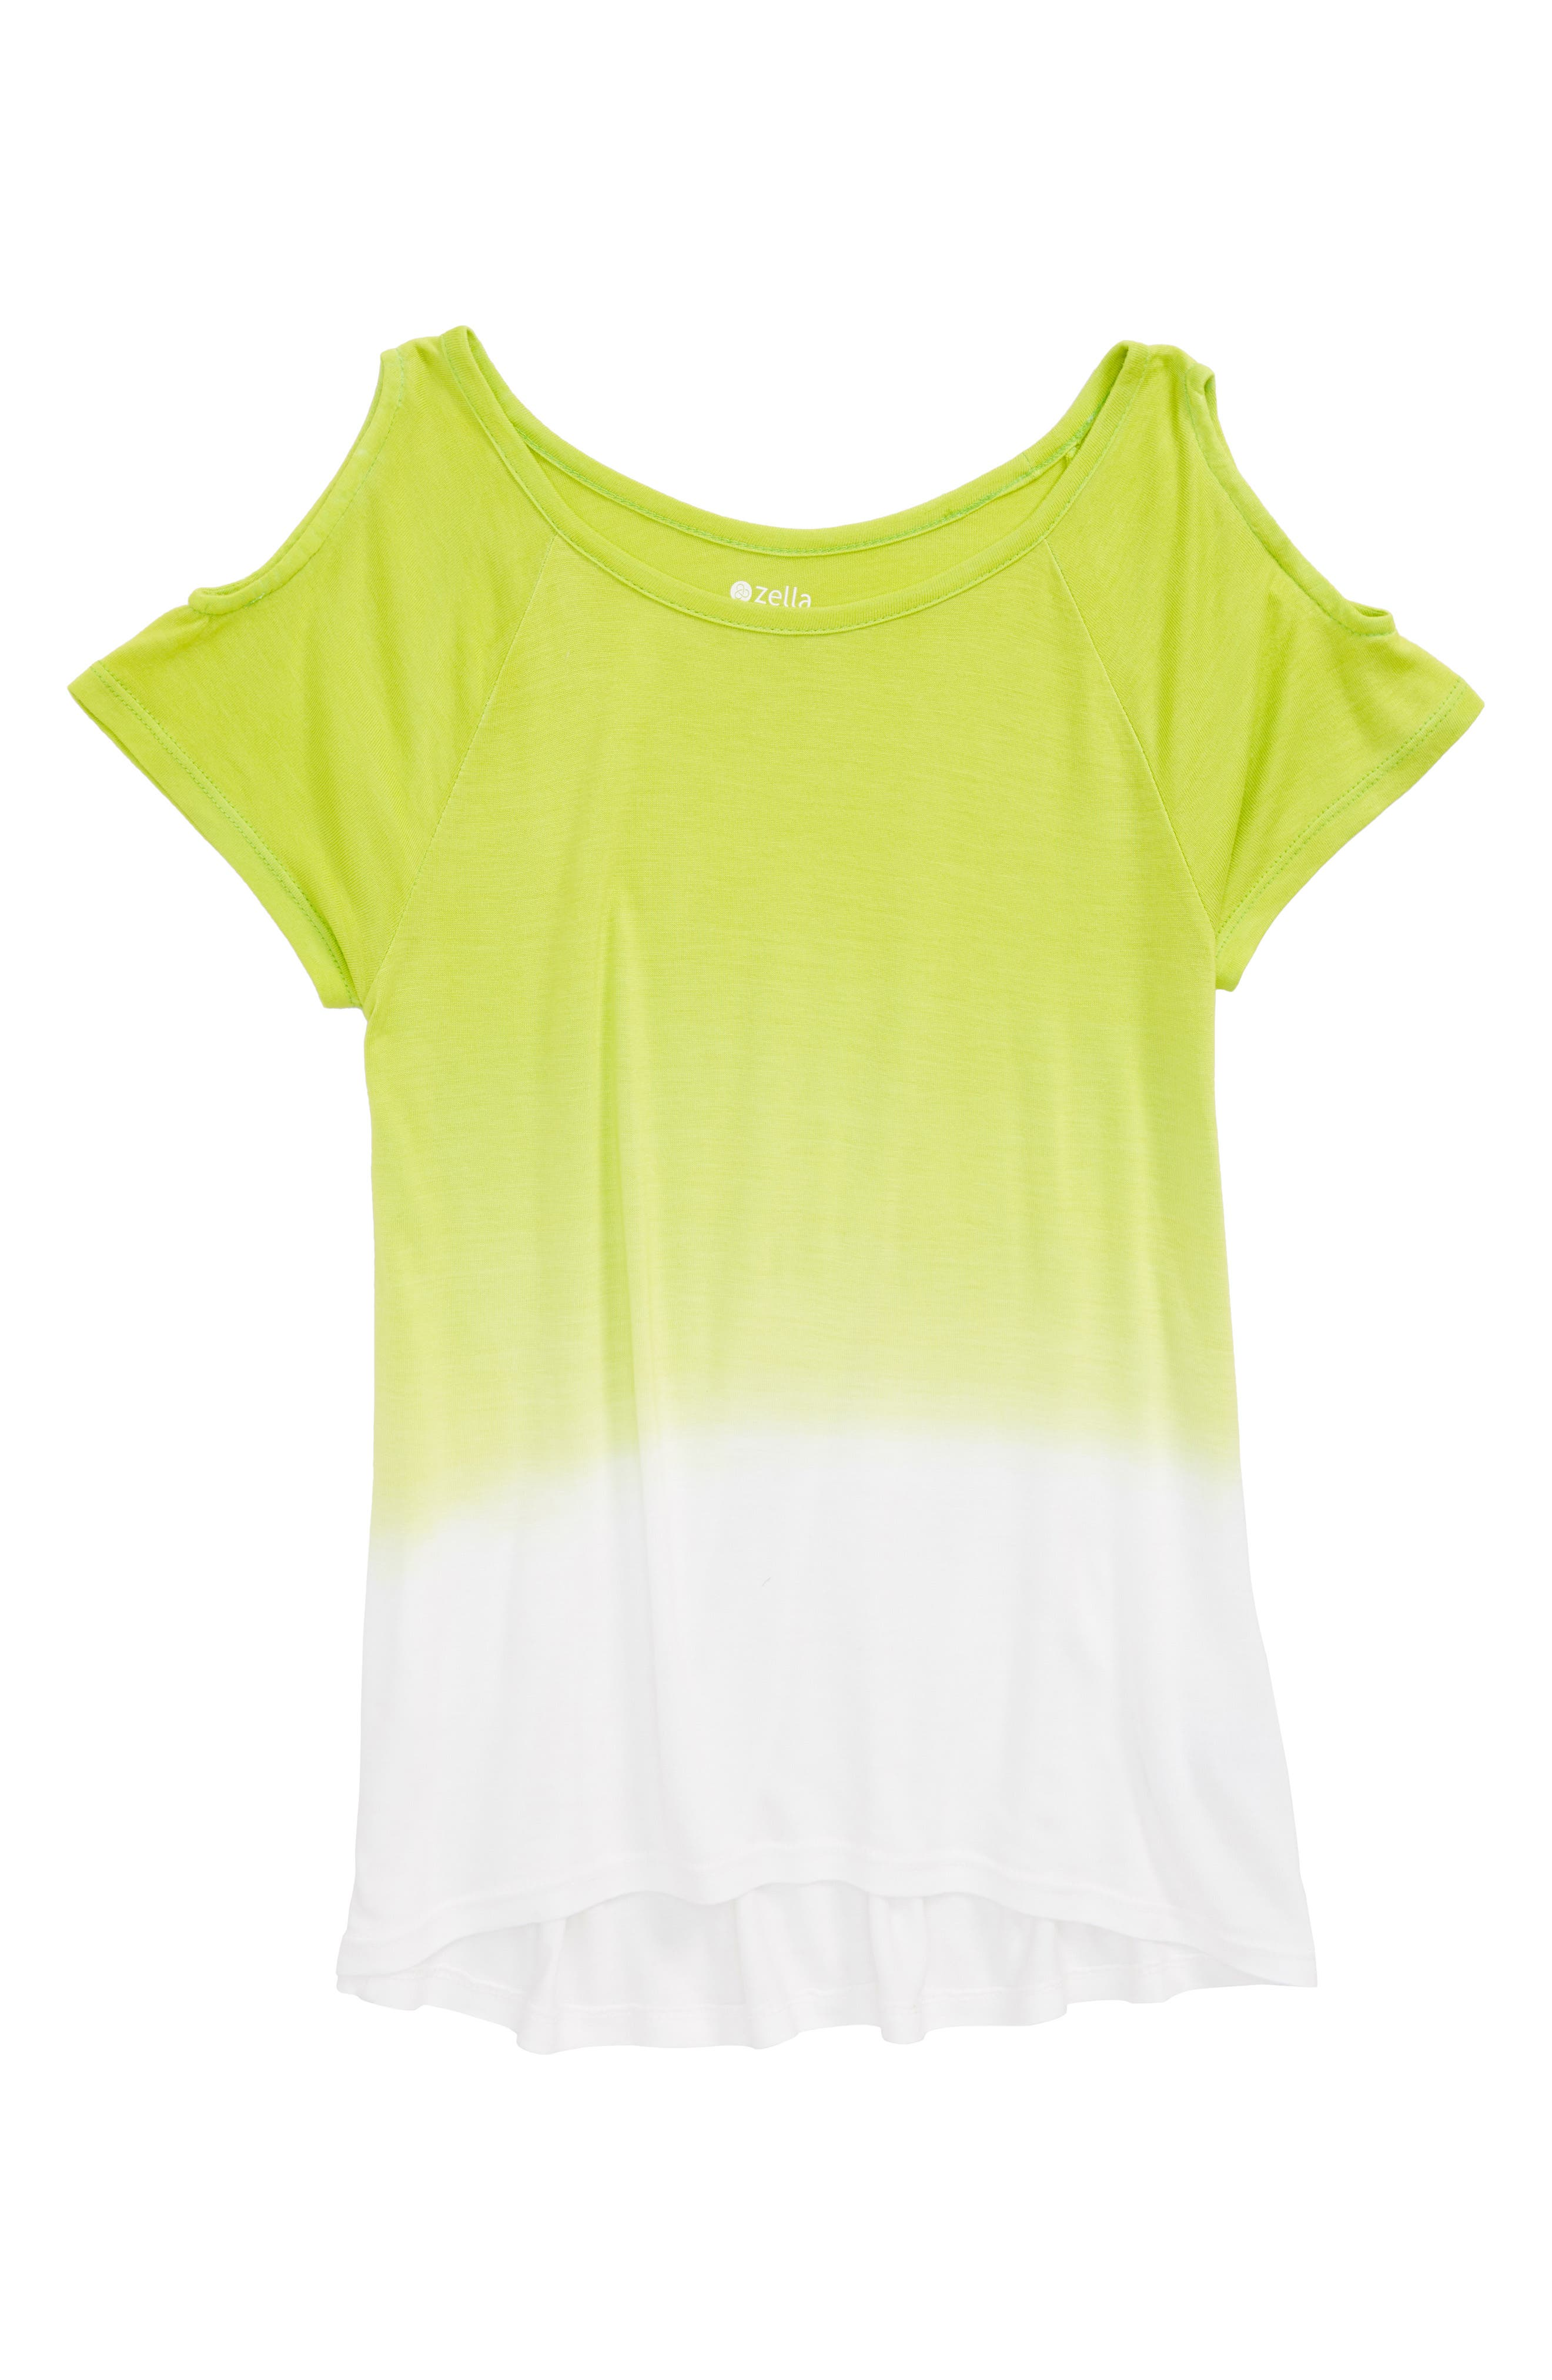 Dip Dye Cold Shoulder Tee,                         Main,                         color, Green Sulphur- White Ombre